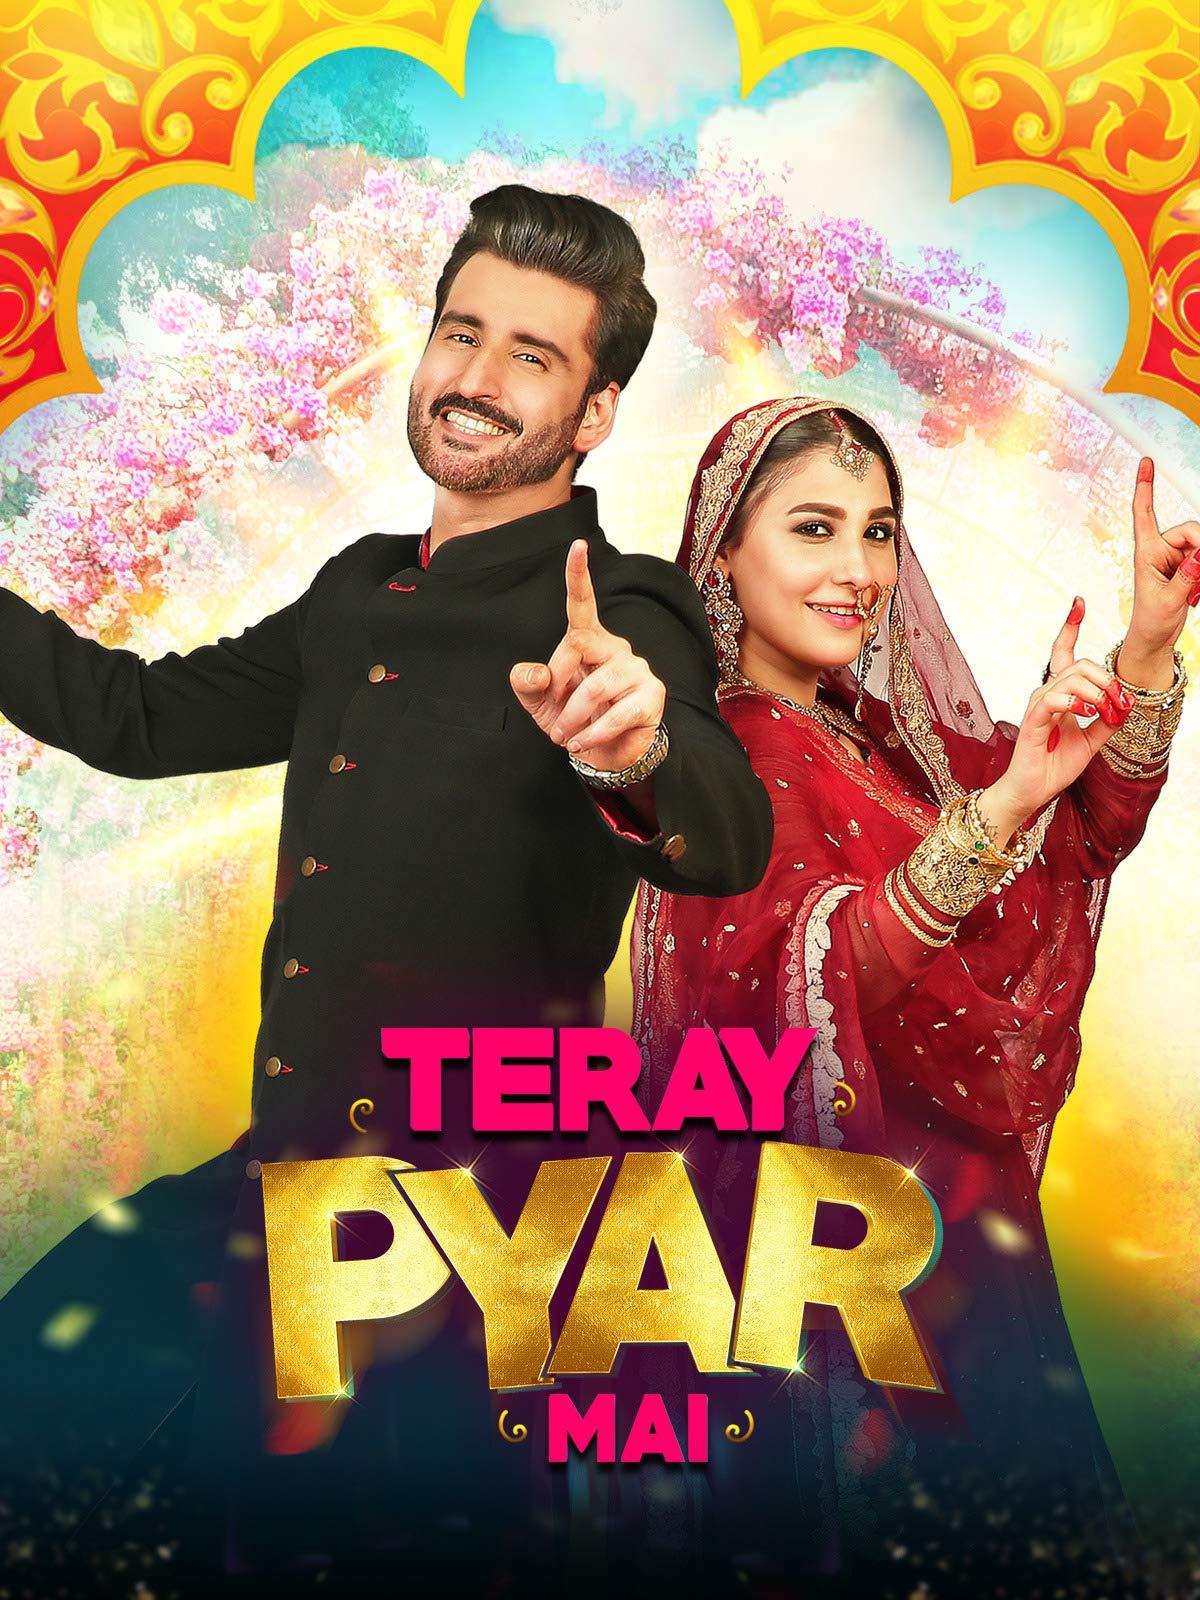 Teray Pyar Mai 2020 Urdu 720p HDRip Esubs DL